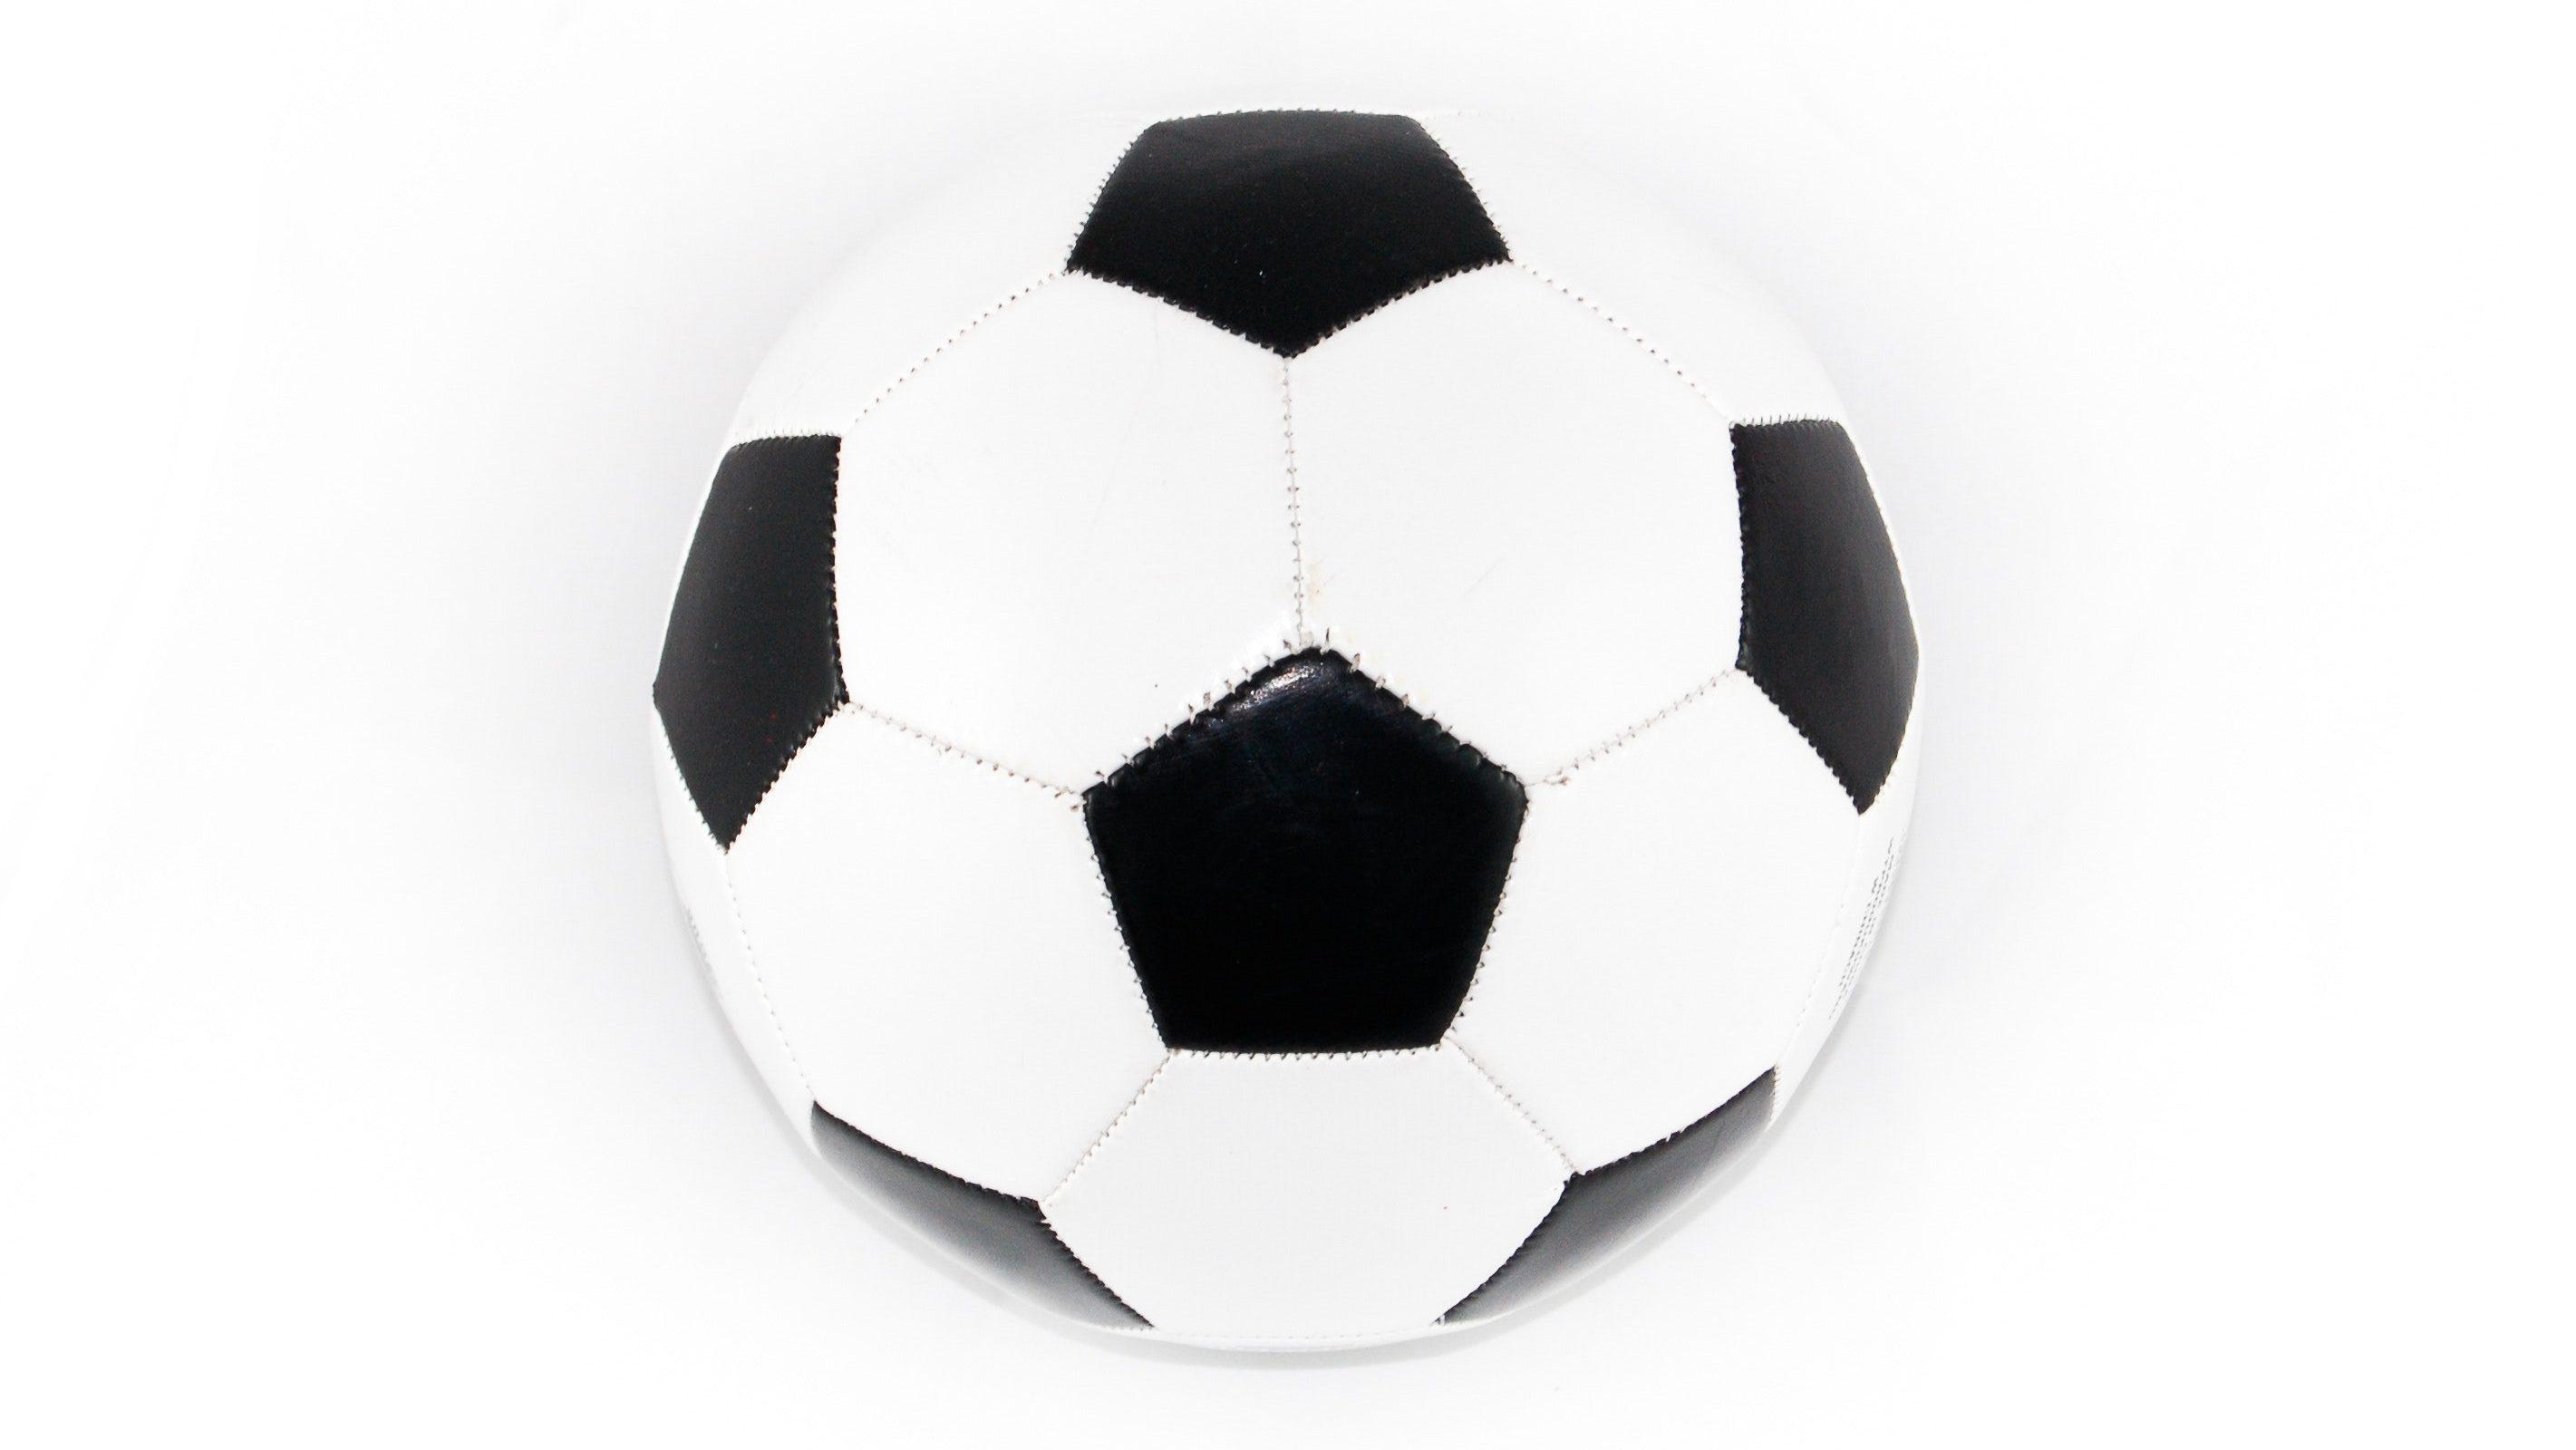 First Week of Colron Football Season